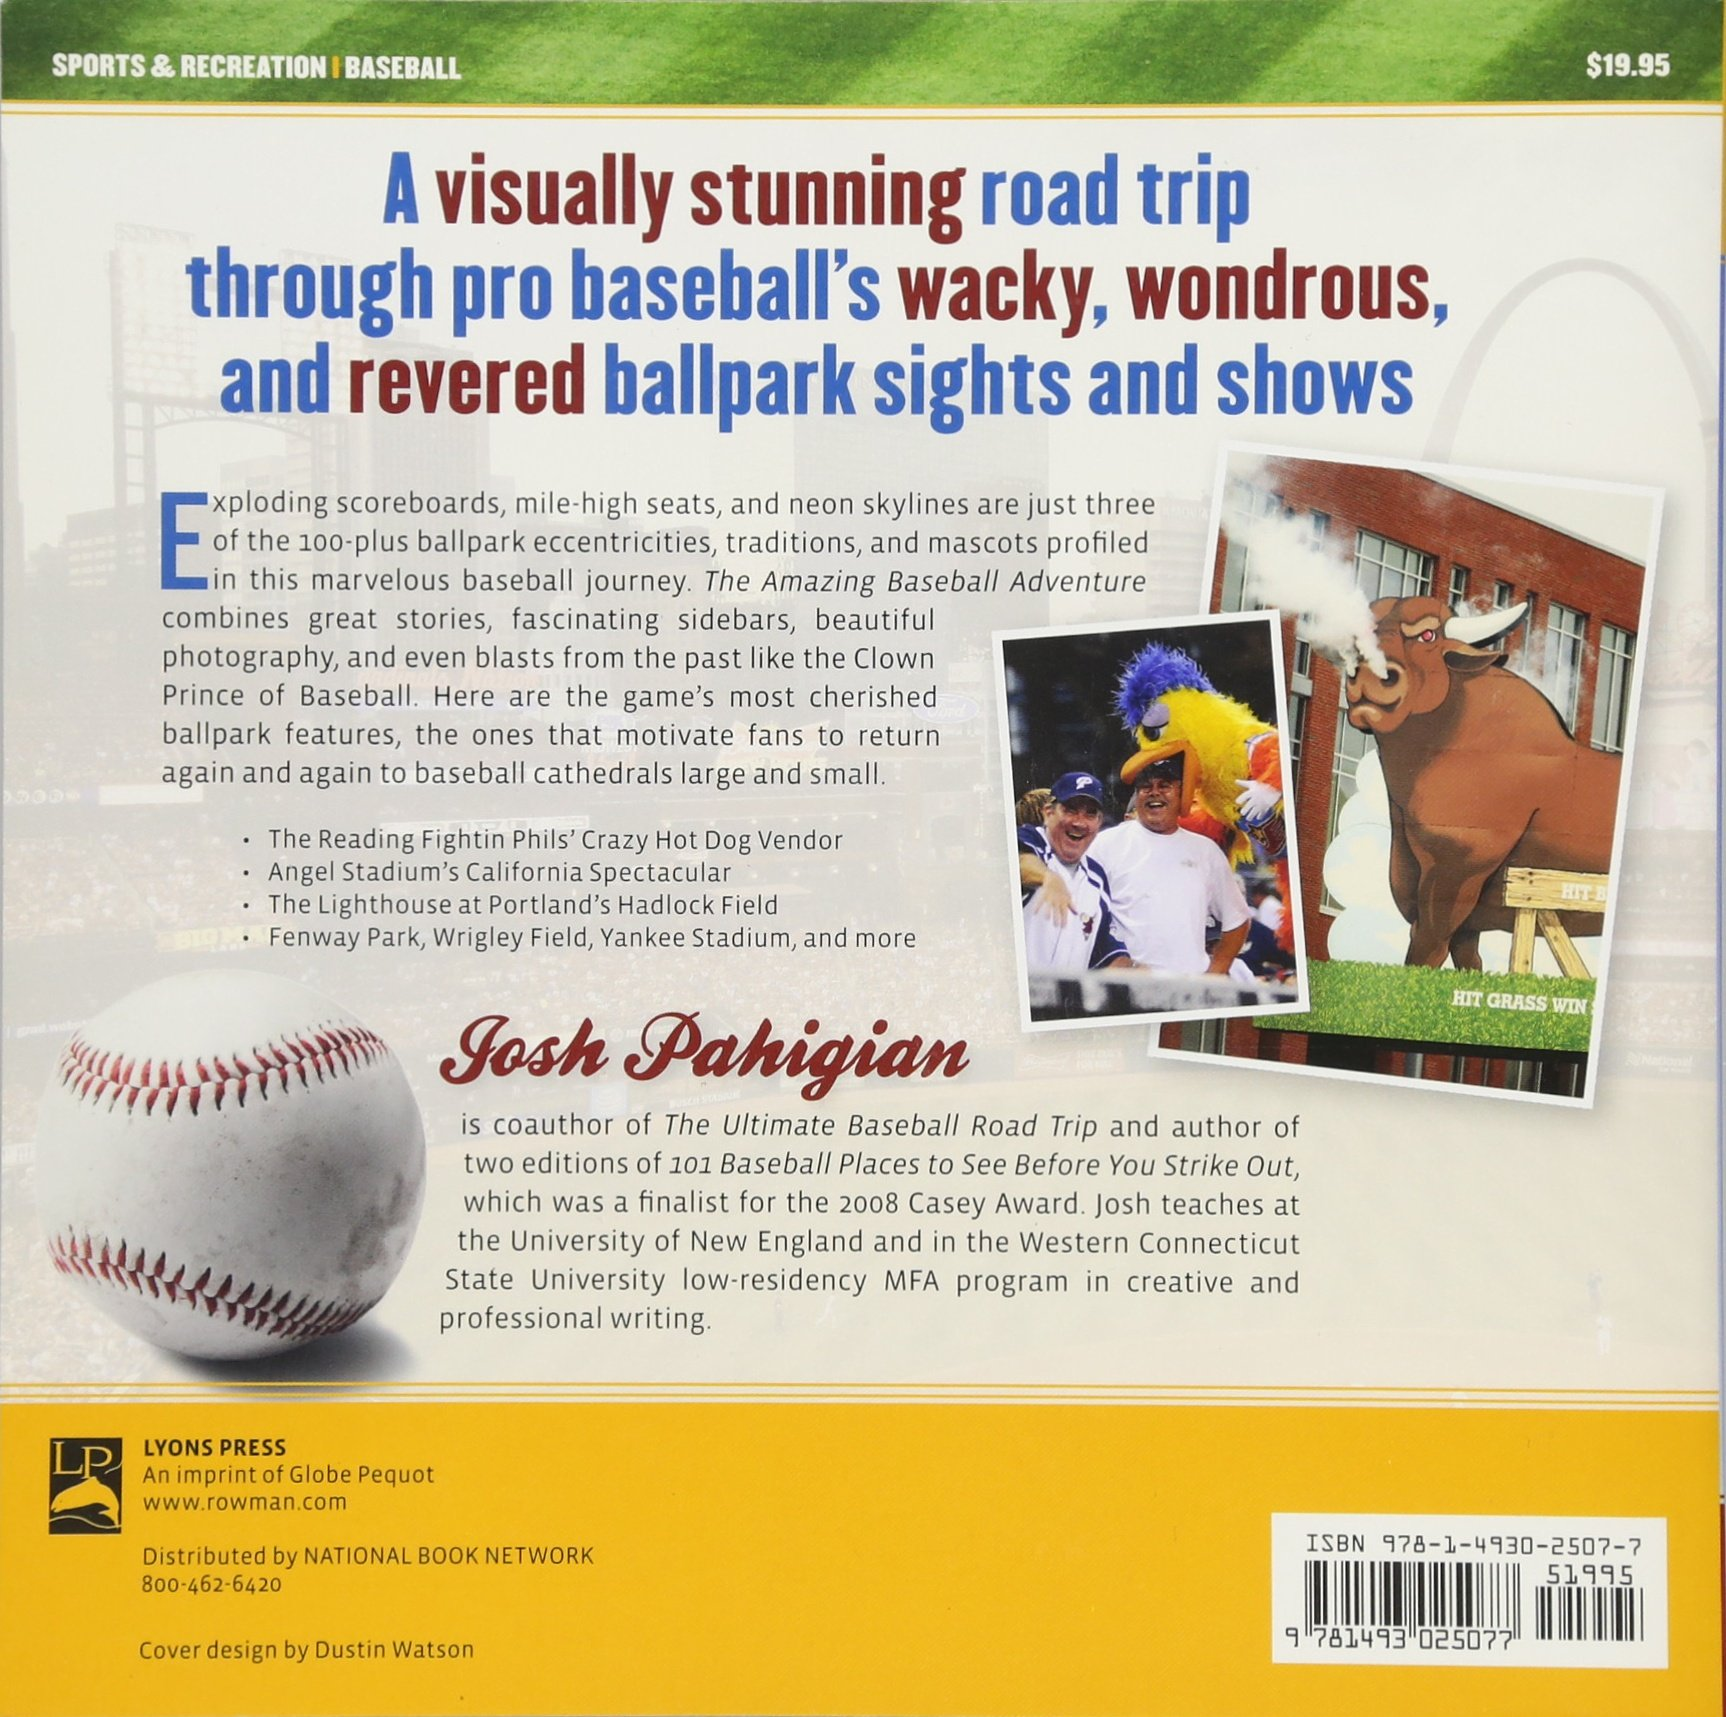 The Amazing Baseball Adventure: Ballpark Wonders from the Bushes to the  Show: Josh Pahigian: 9781493025077: Amazon.com: Books